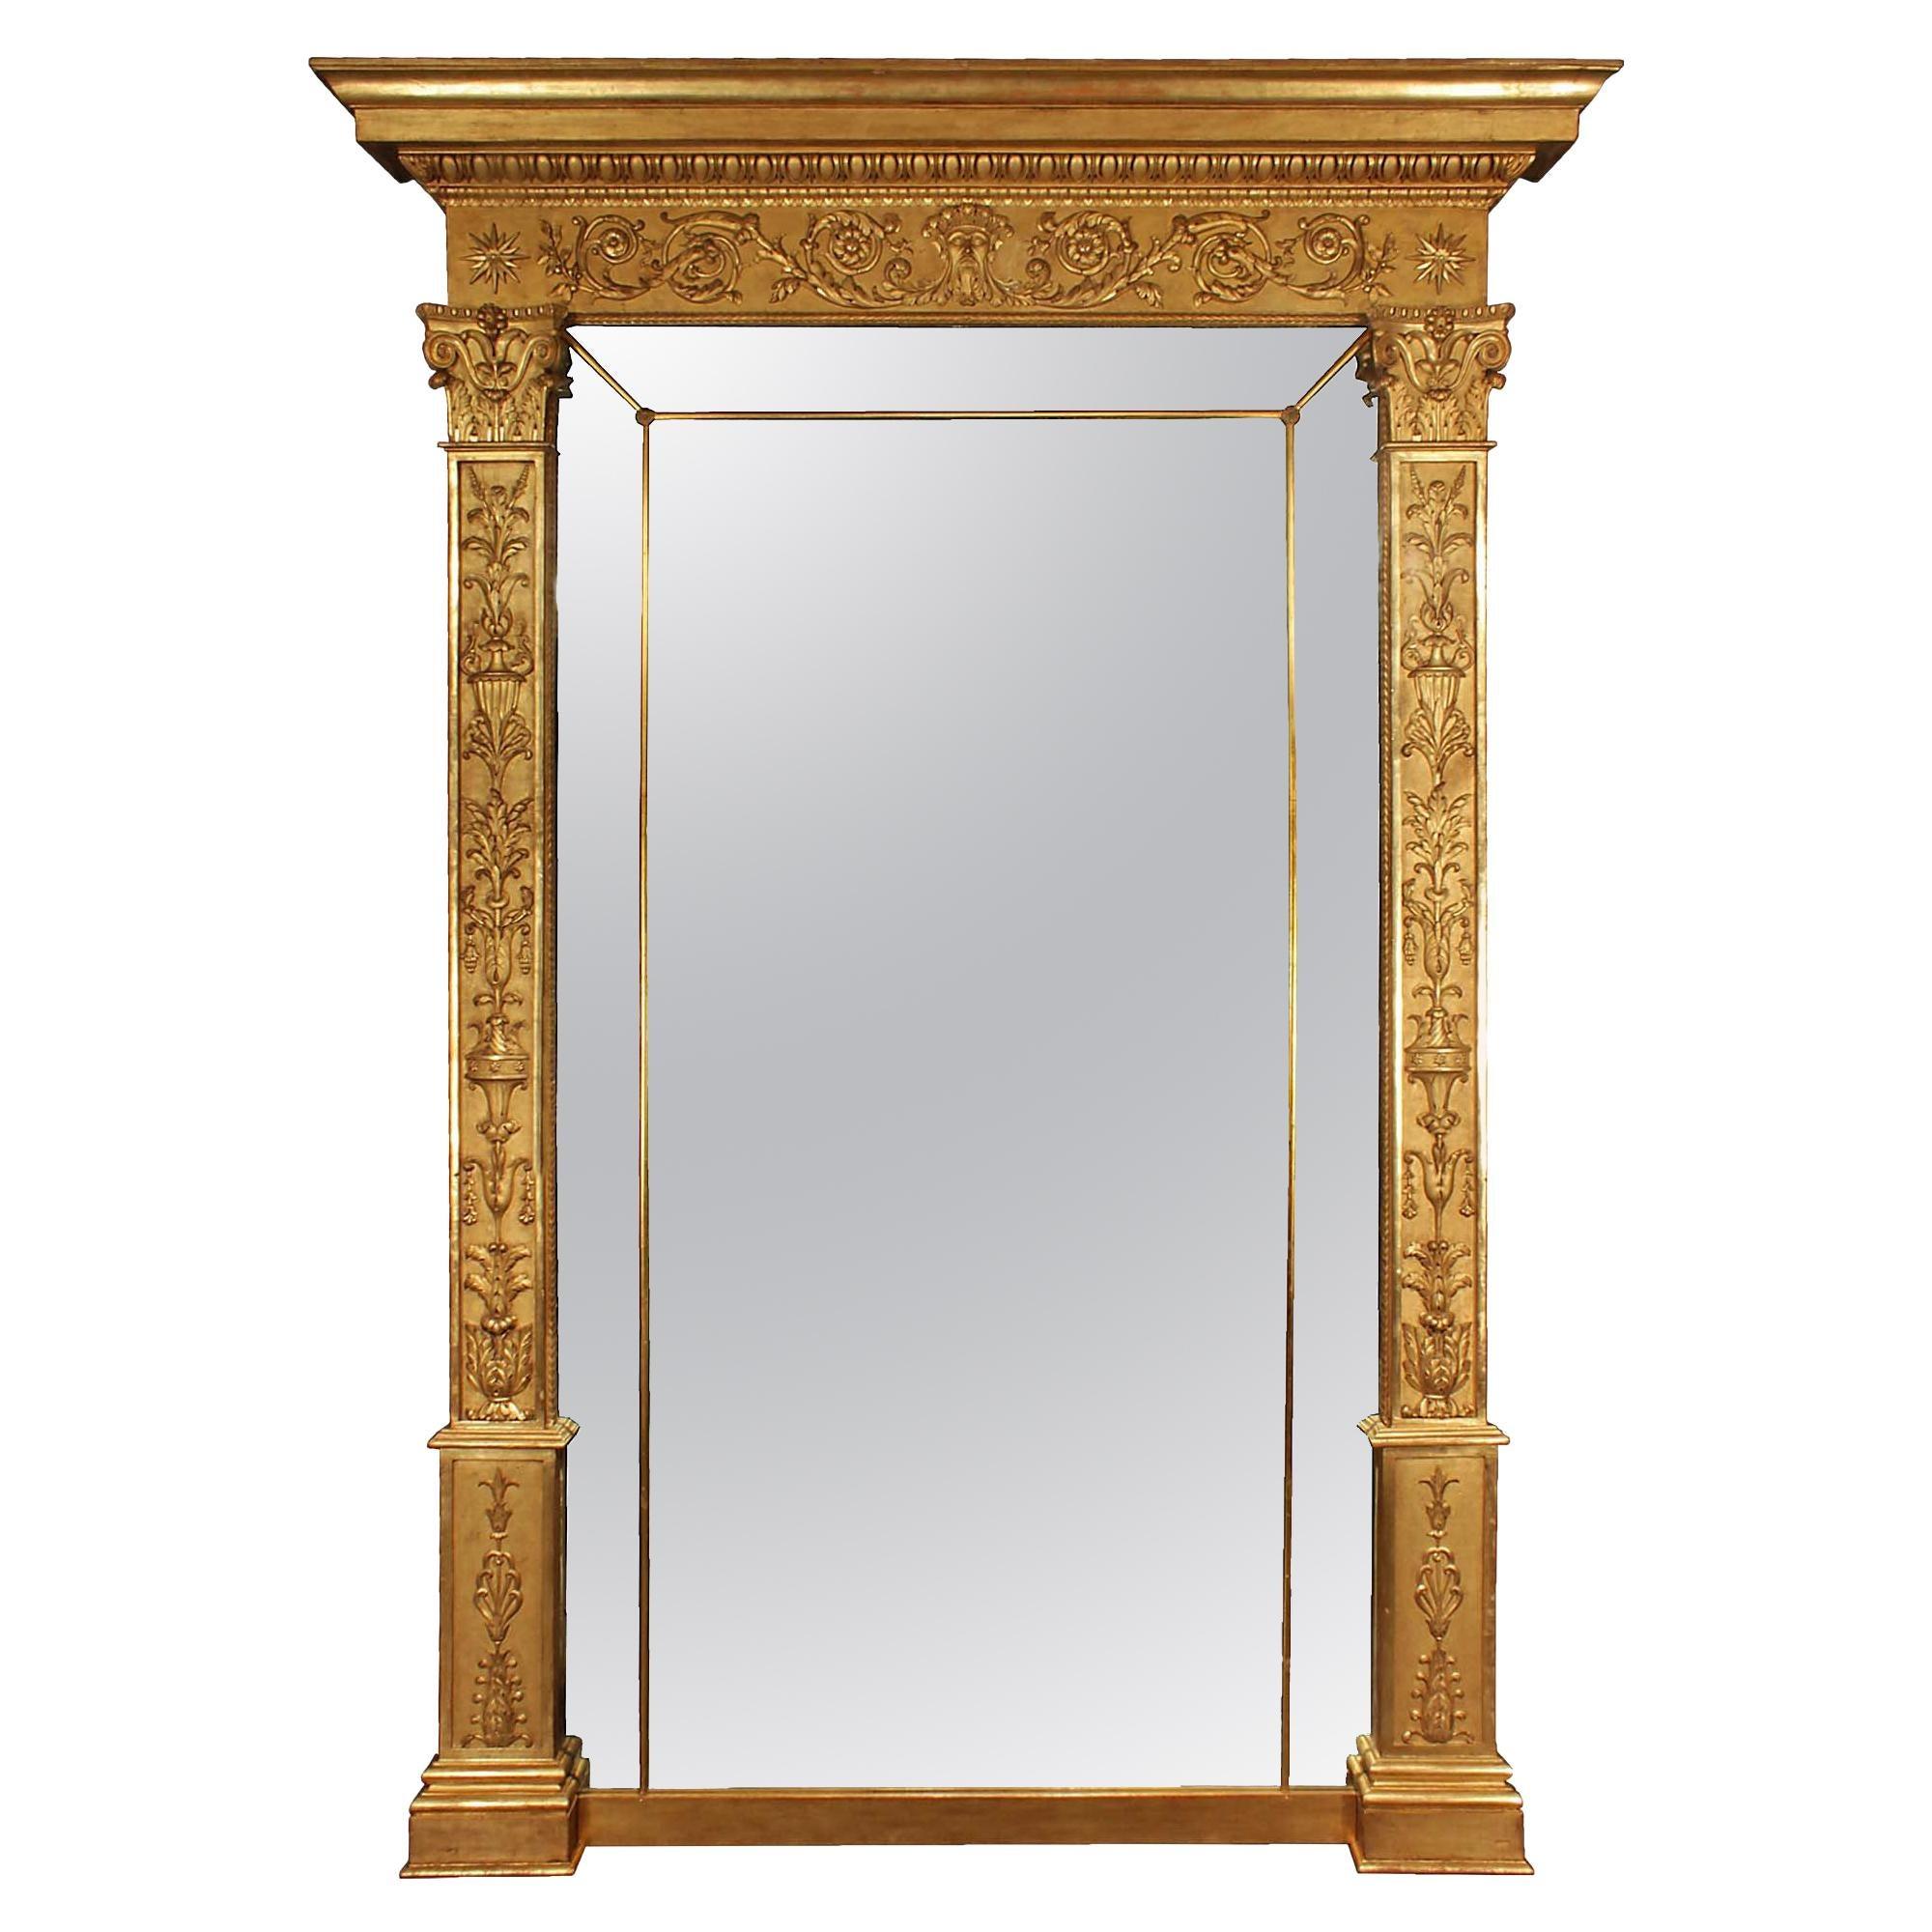 Italian 19th Century Neoclassical Style Giltwood Mirror